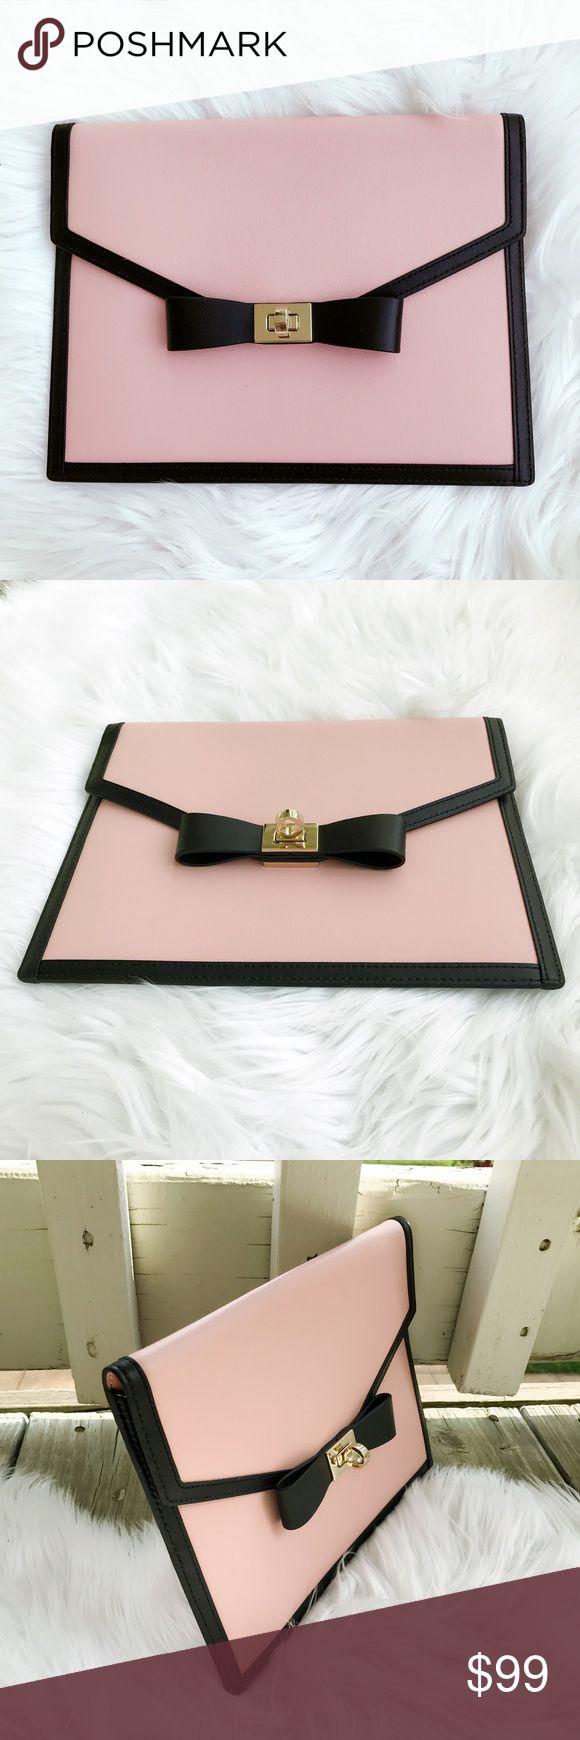 Kate Spade Mayfair Drive Bow Envelope Clutch NWOT, beautiful baby pink envelope clutch. Spade shape button closure🎀 kate spade Bags